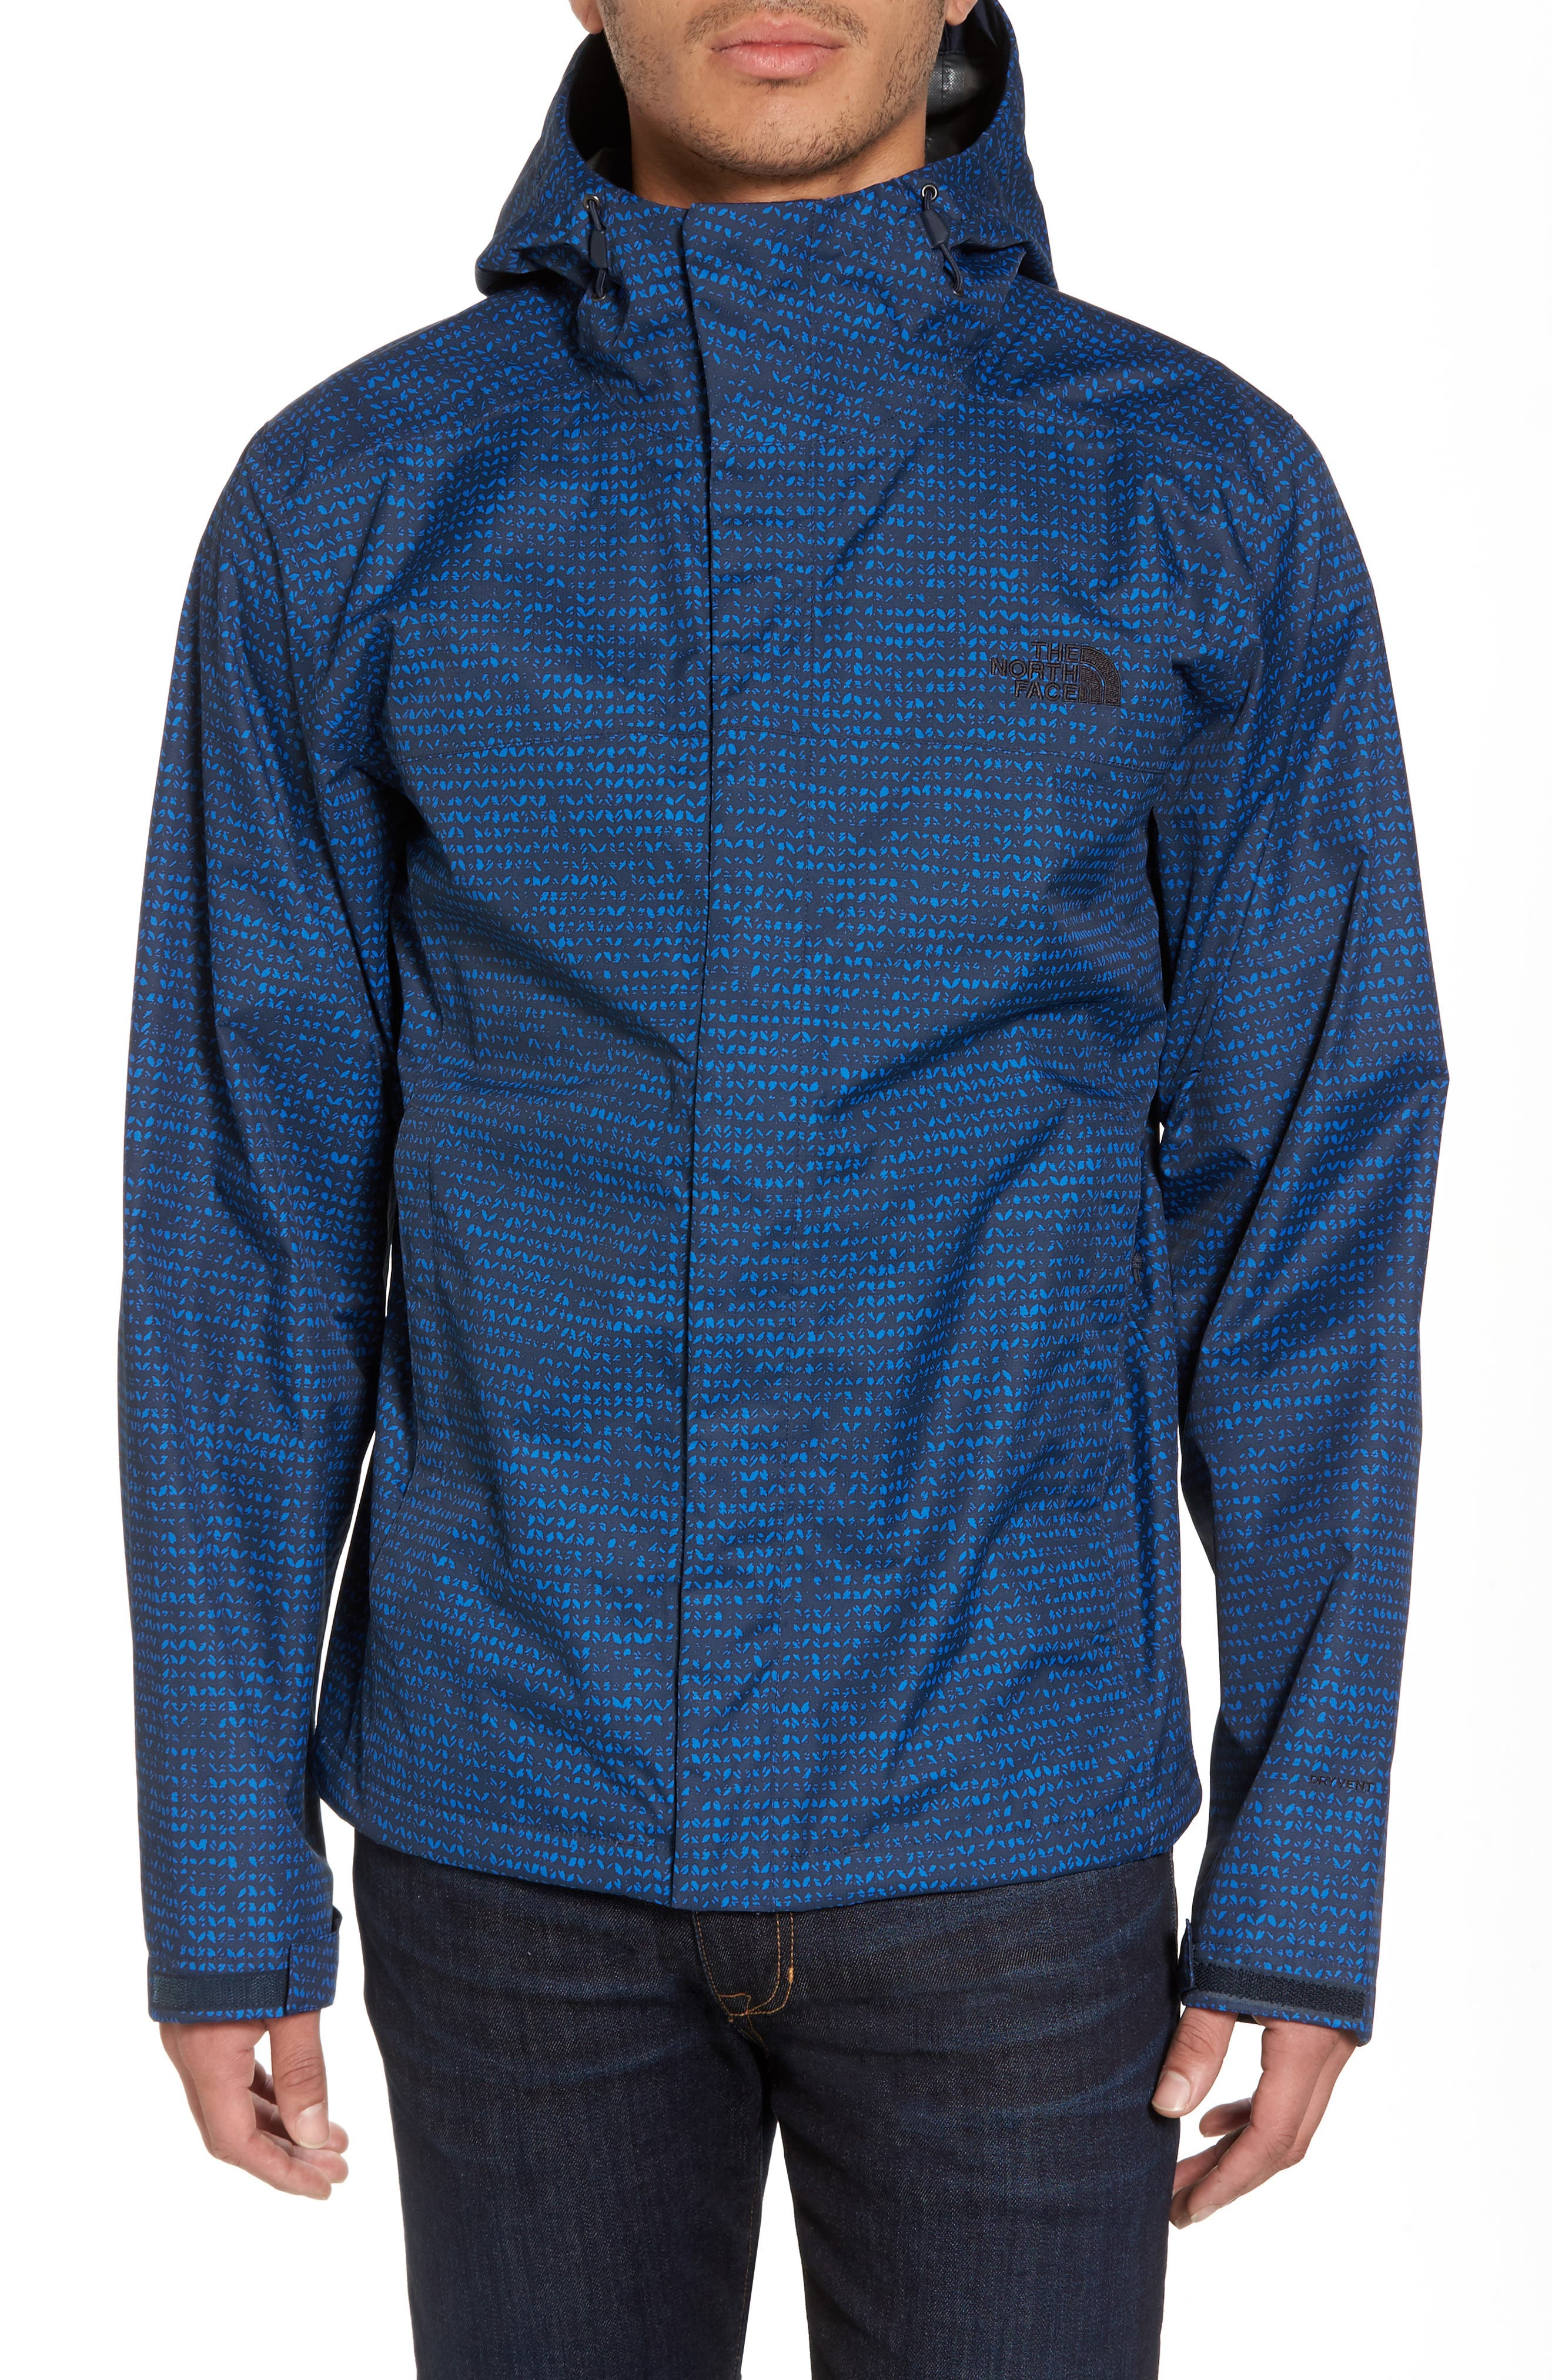 Alternate Image 1 Selected - The North Face Venture Waterproof DryVent® Jacket